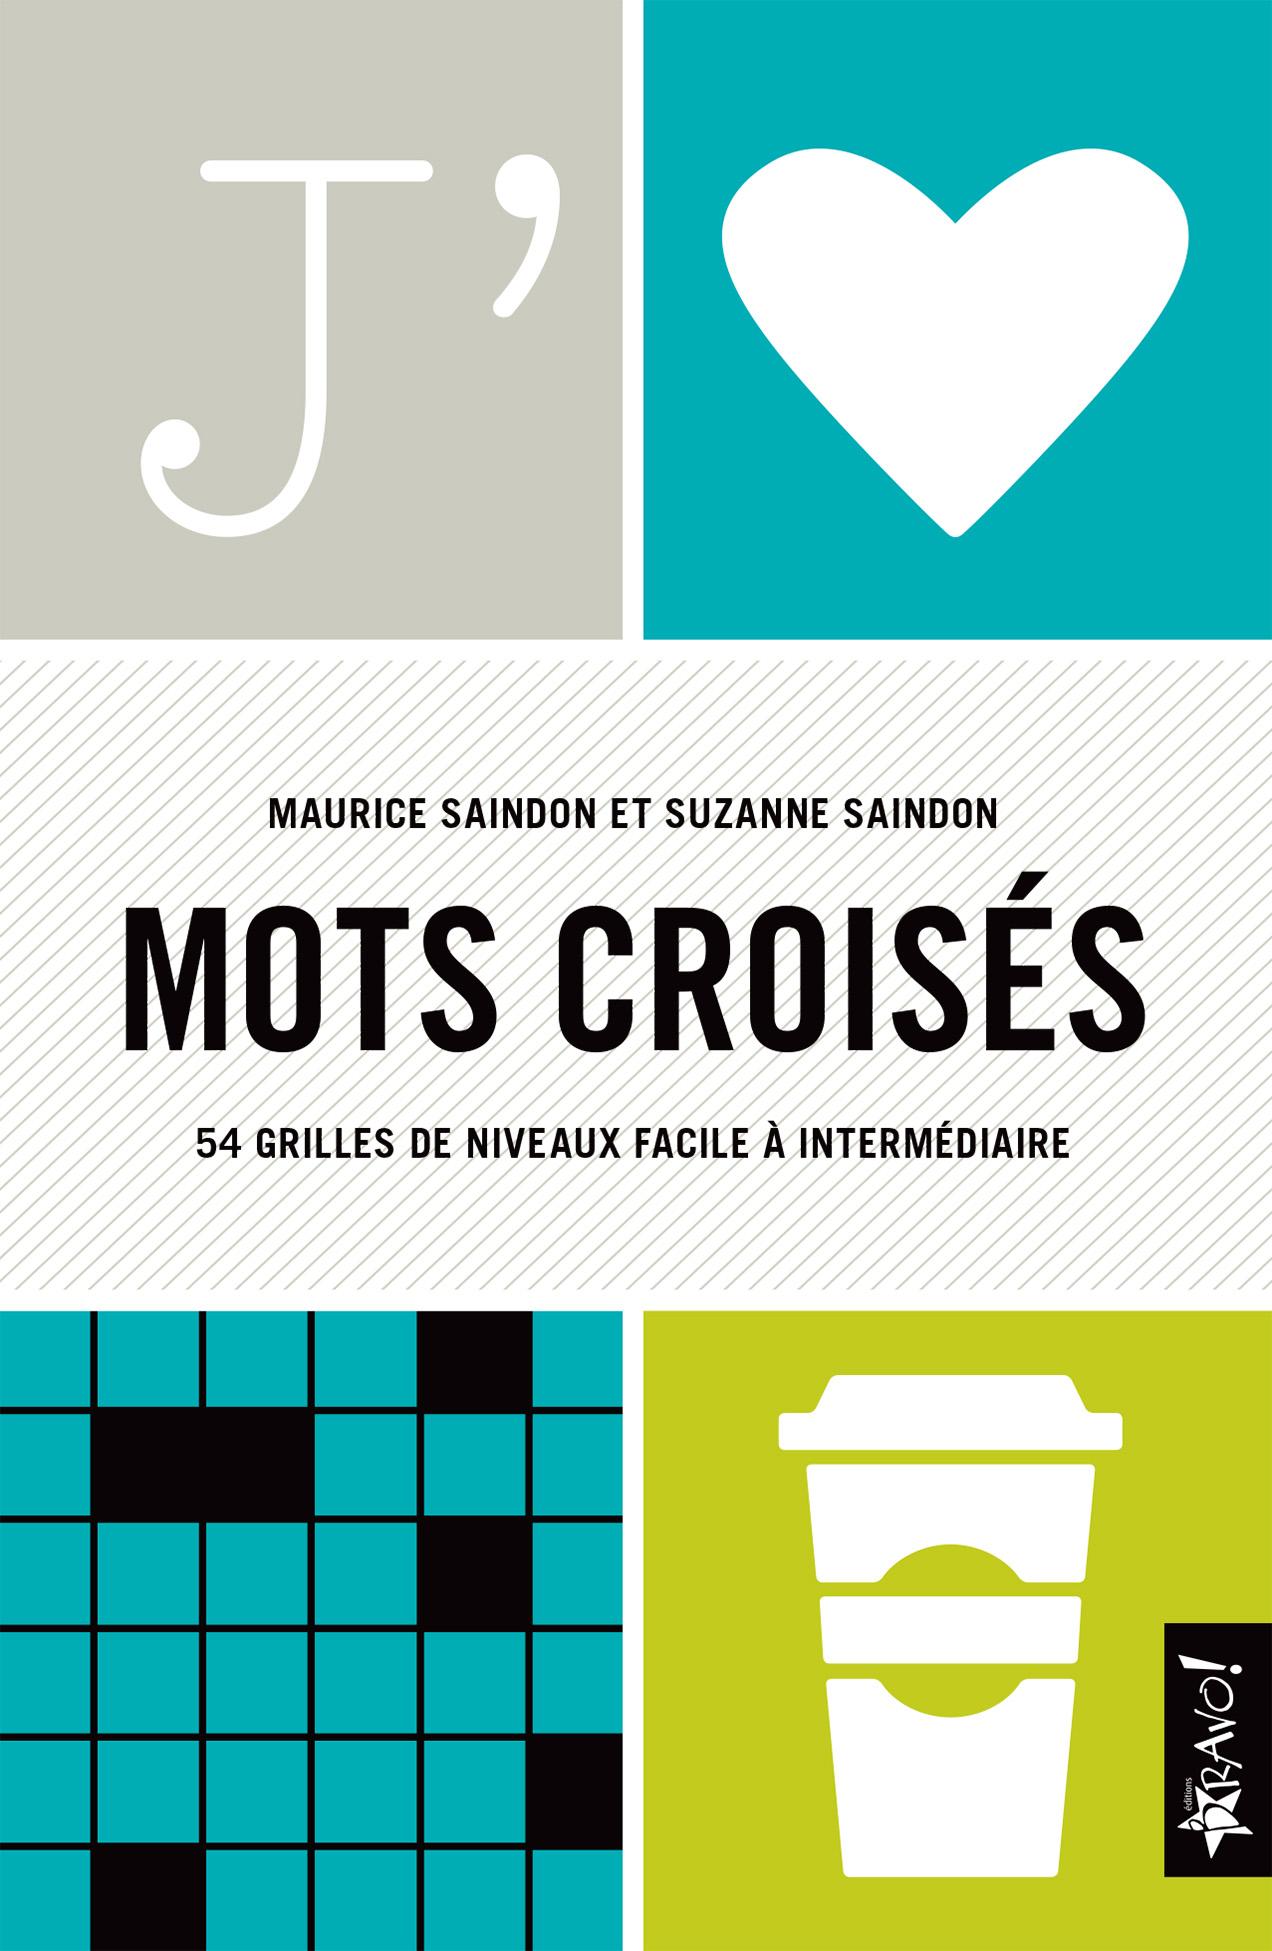 289_J'aimeMotsCroises_C1